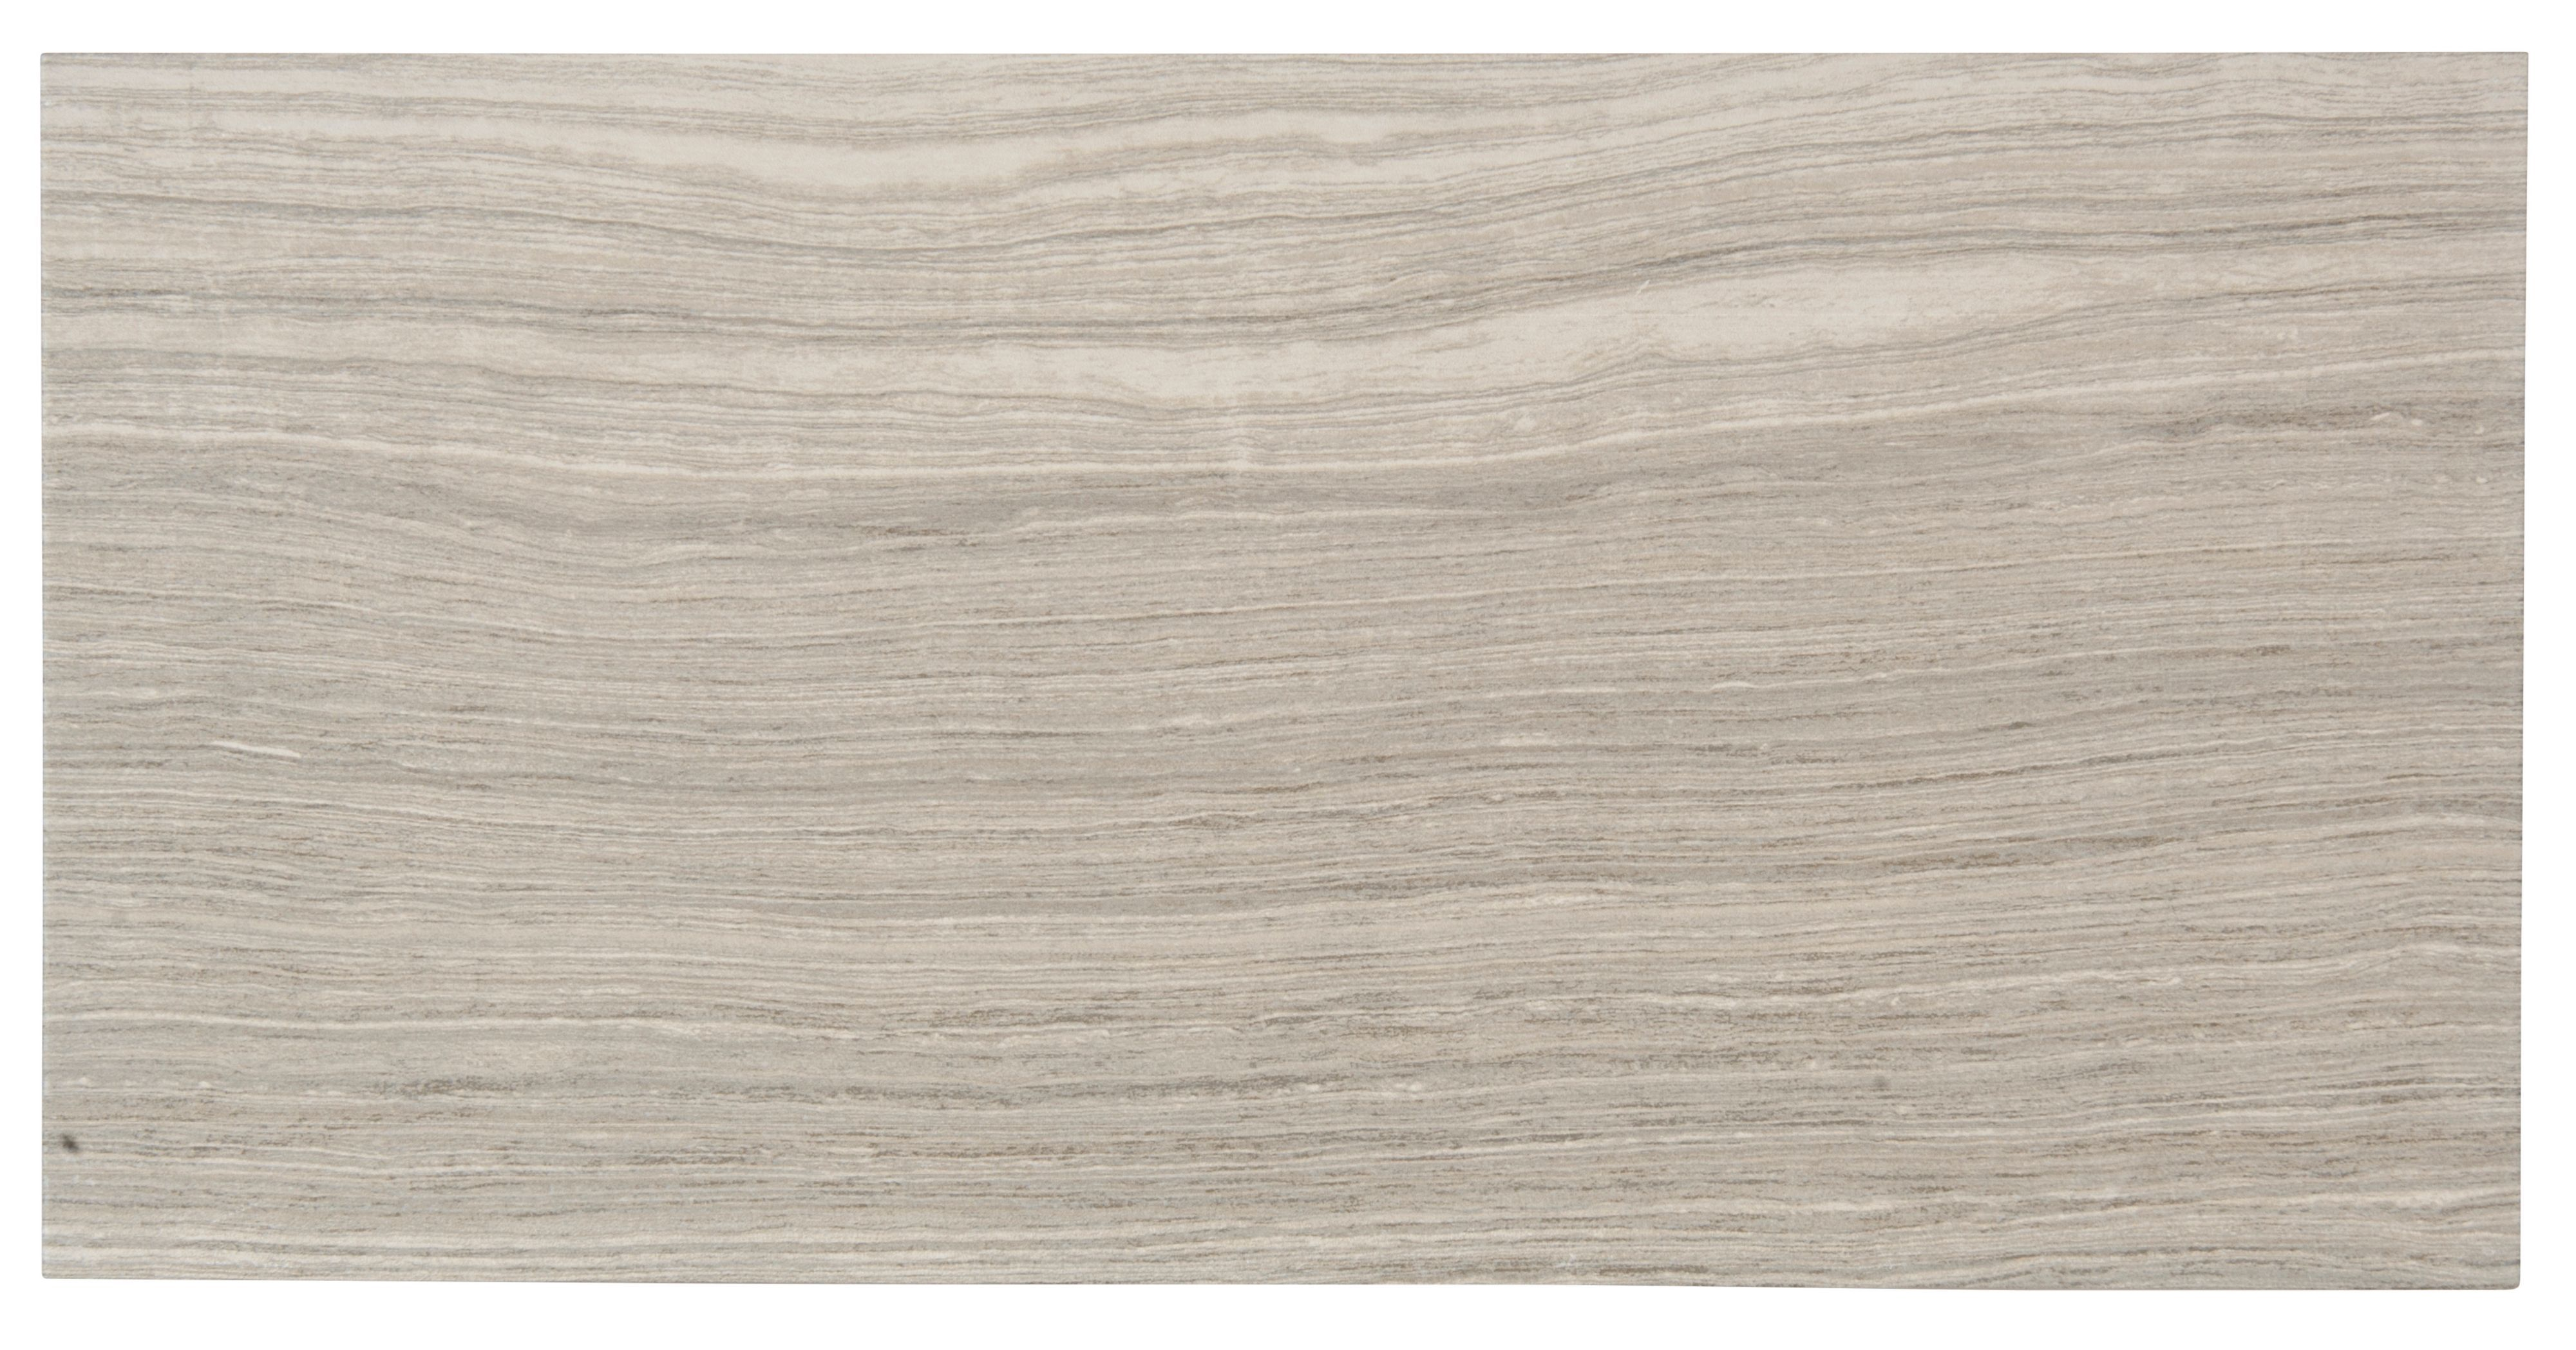 Bolina Grey Porcelain Wall & Floor Tile, Pack of 6, (L)600mm (W)300mm